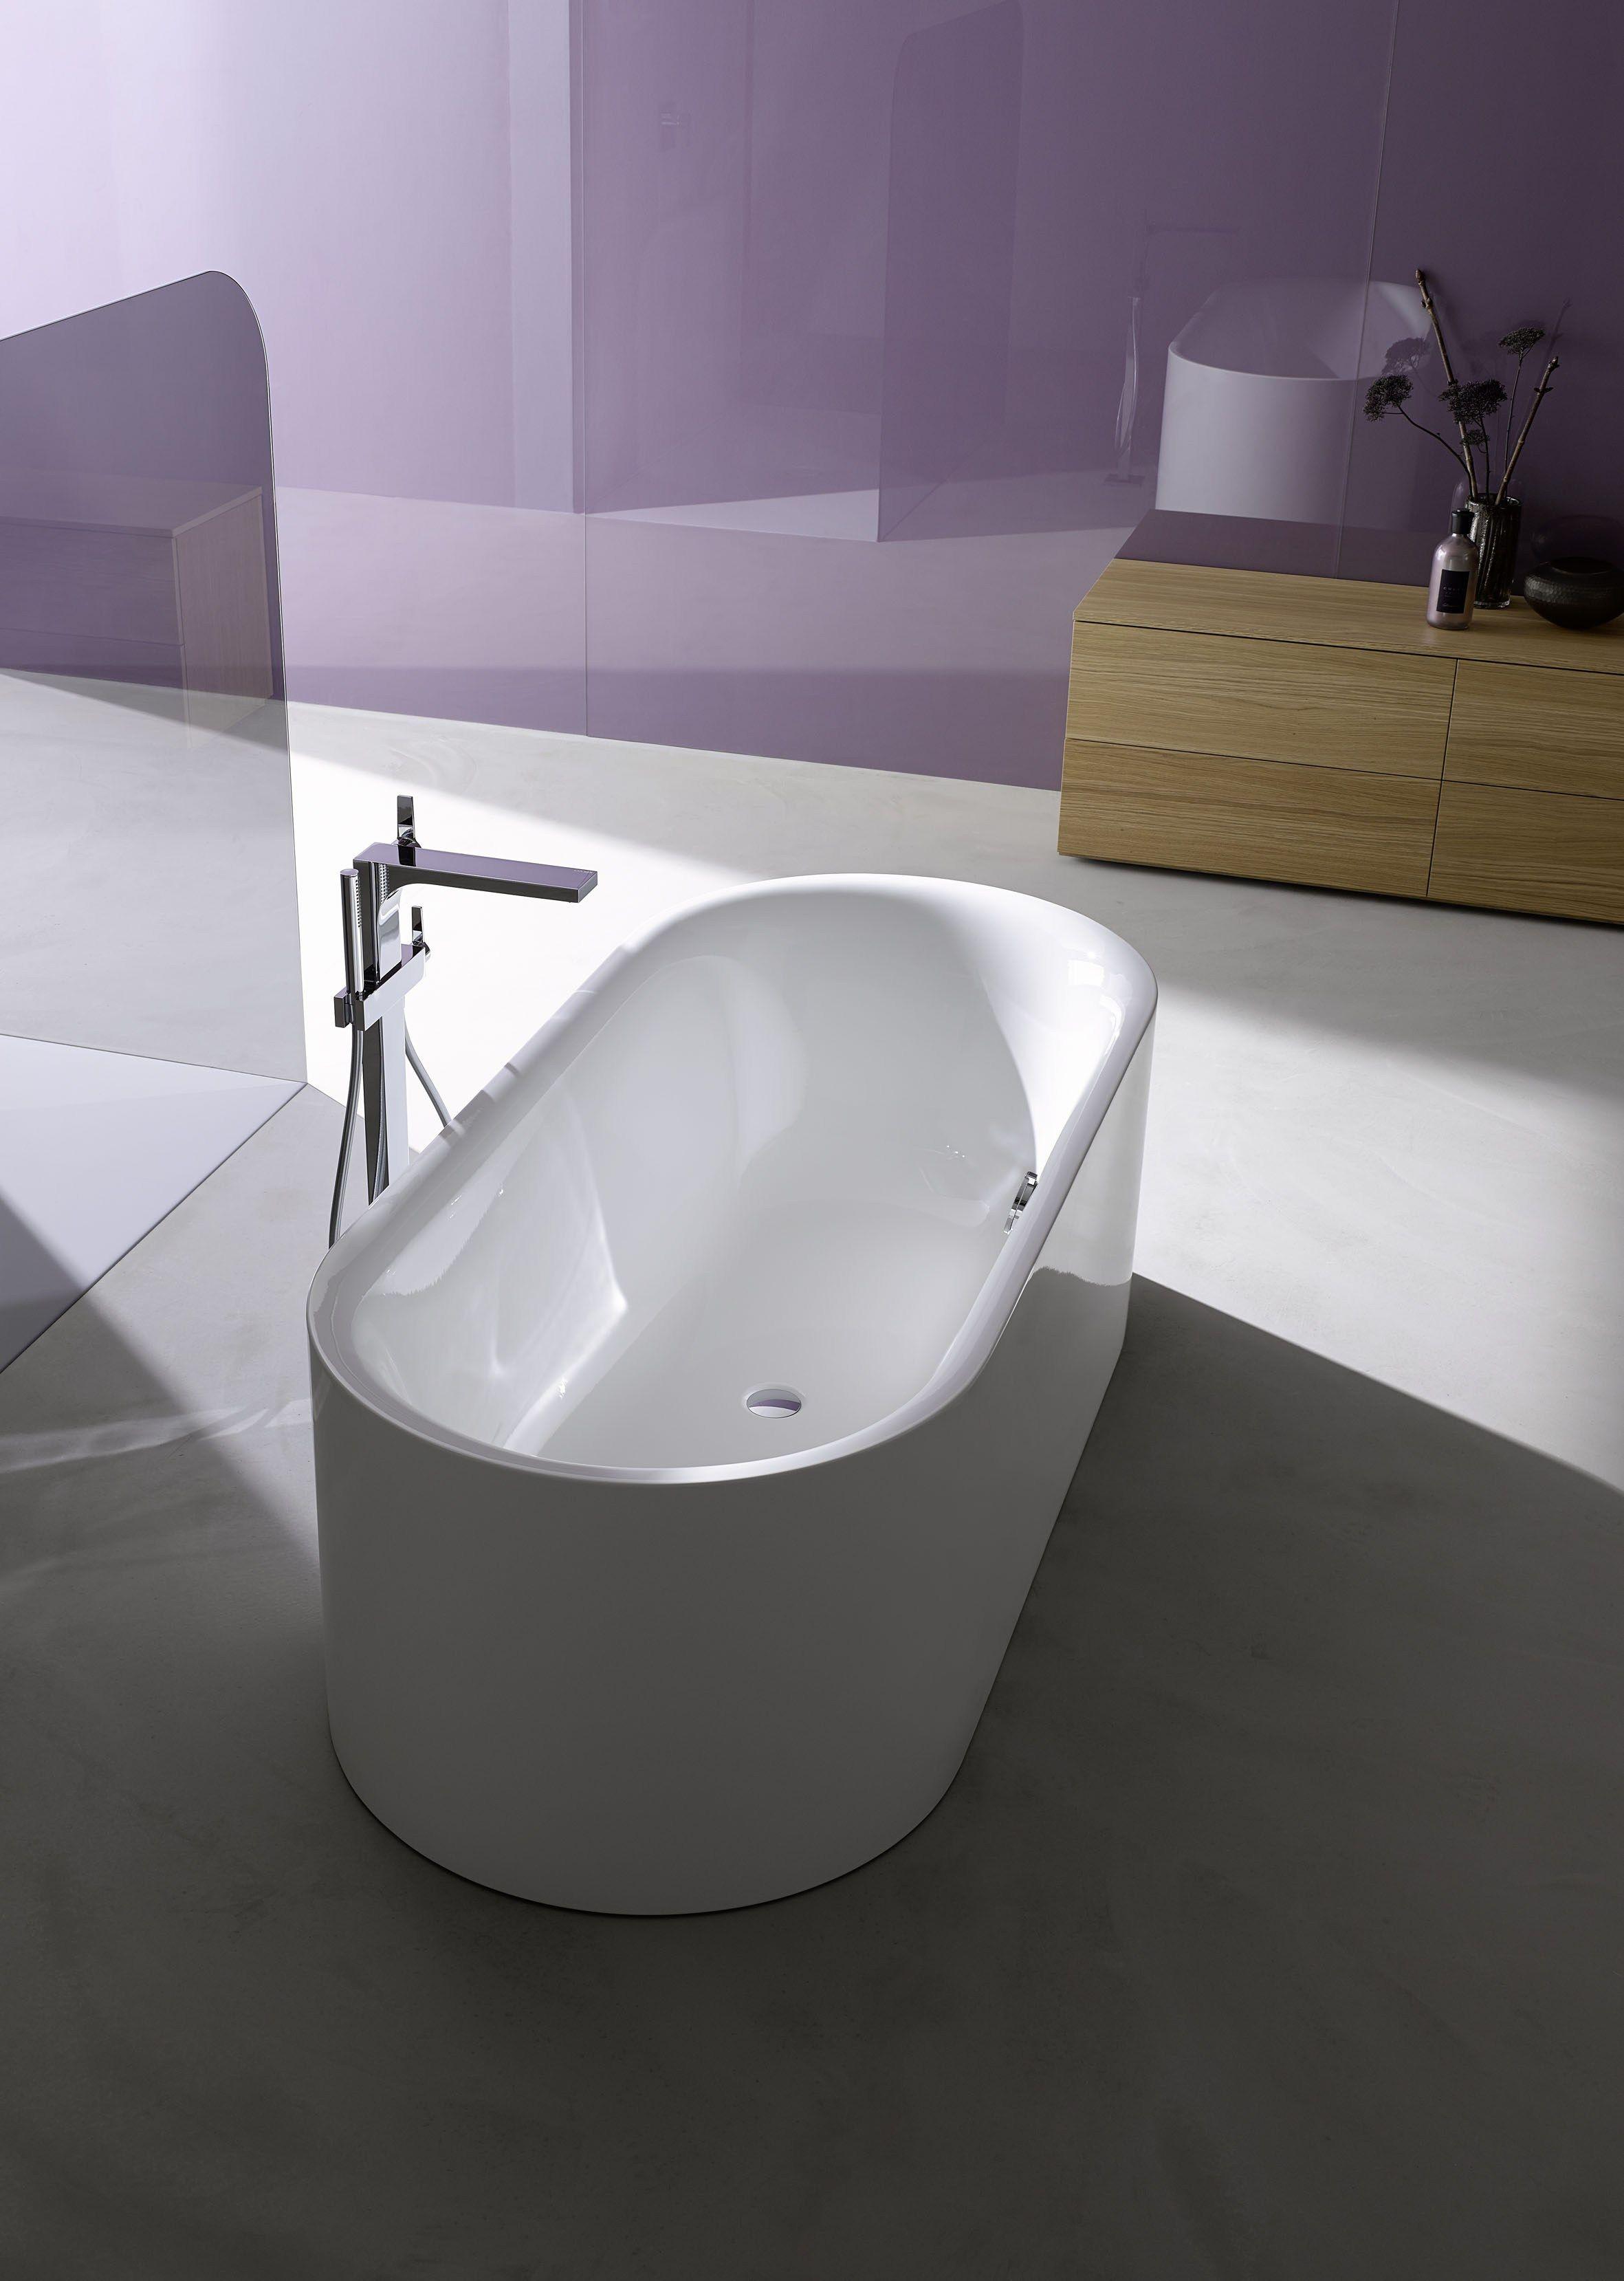 freistehende ovale badewanne bettelux oval silhouette by bette design tesseraux partner. Black Bedroom Furniture Sets. Home Design Ideas